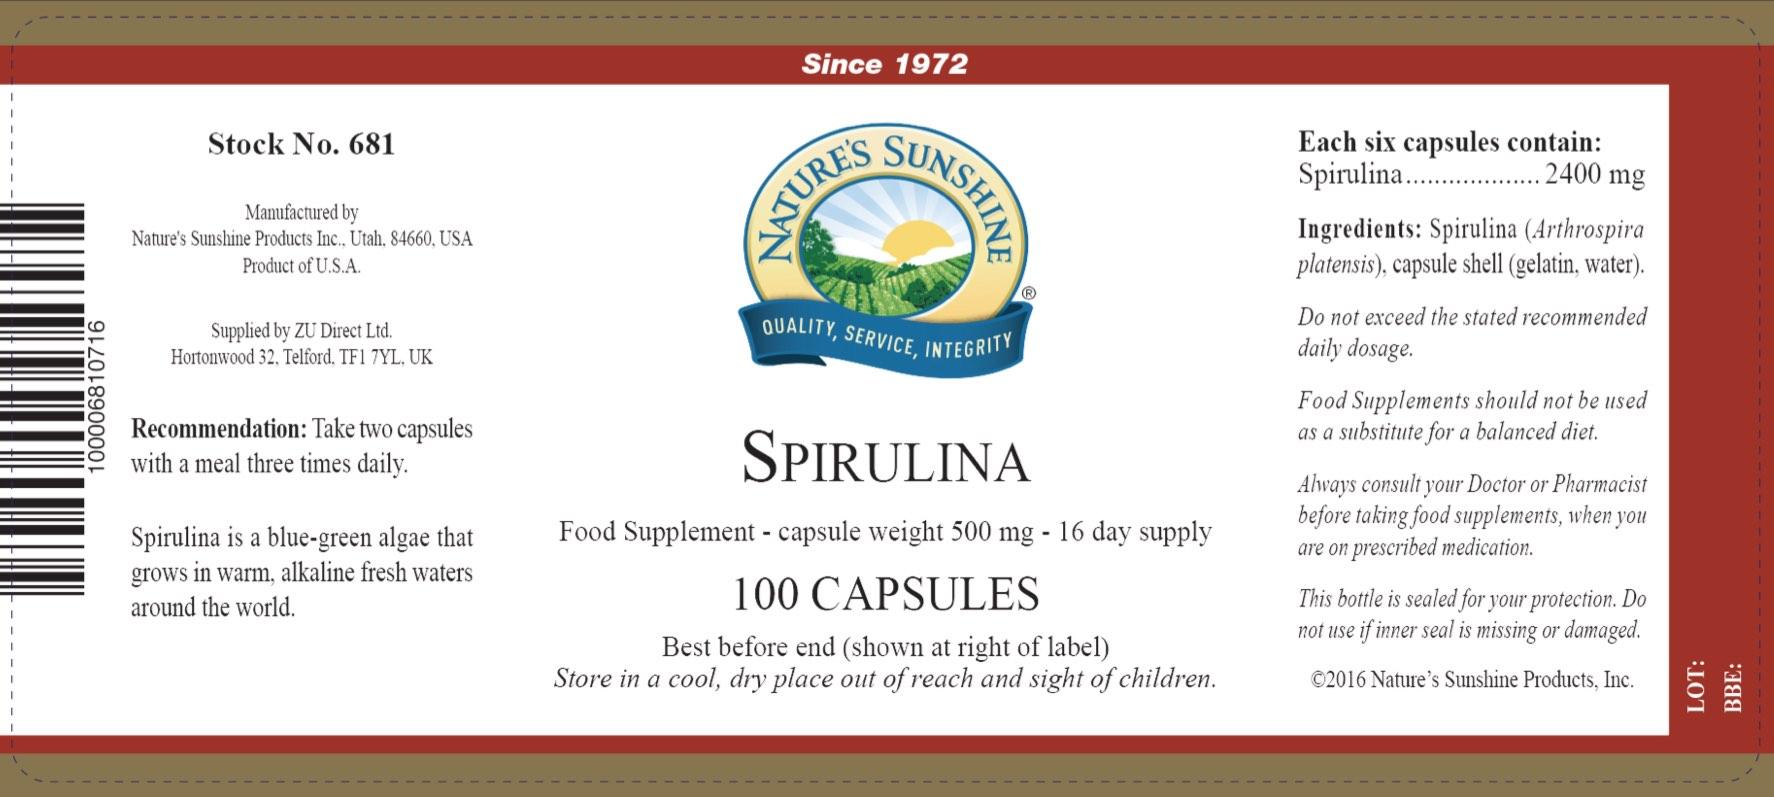 Nature's Sunshine - Spirulina - Label